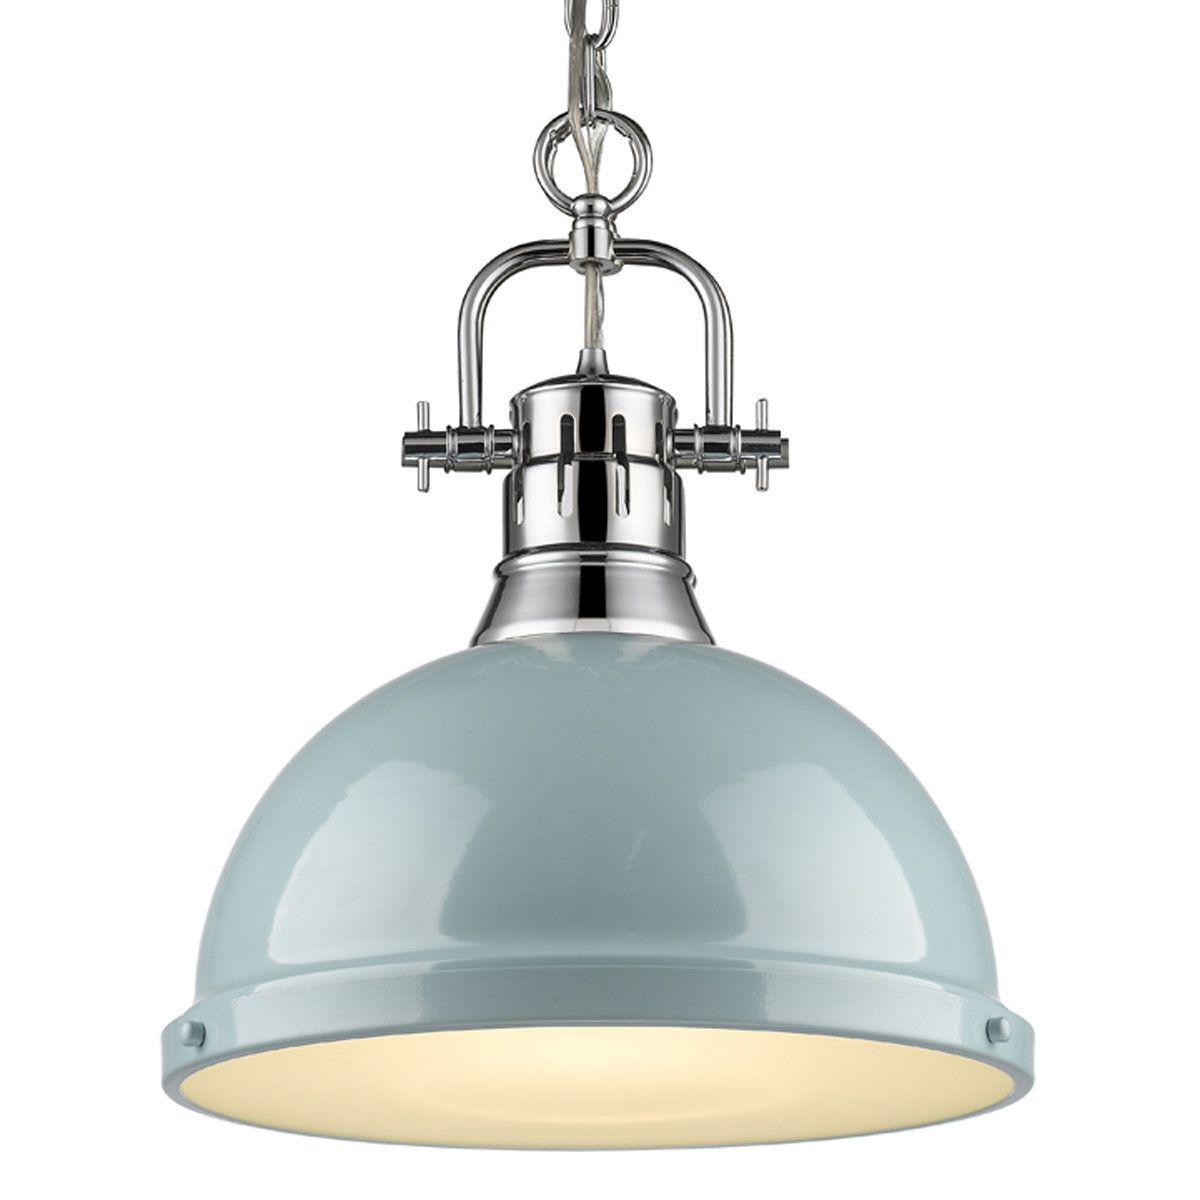 classic pendant lighting. Classic Dome Large Shade Pendant Light Lighting